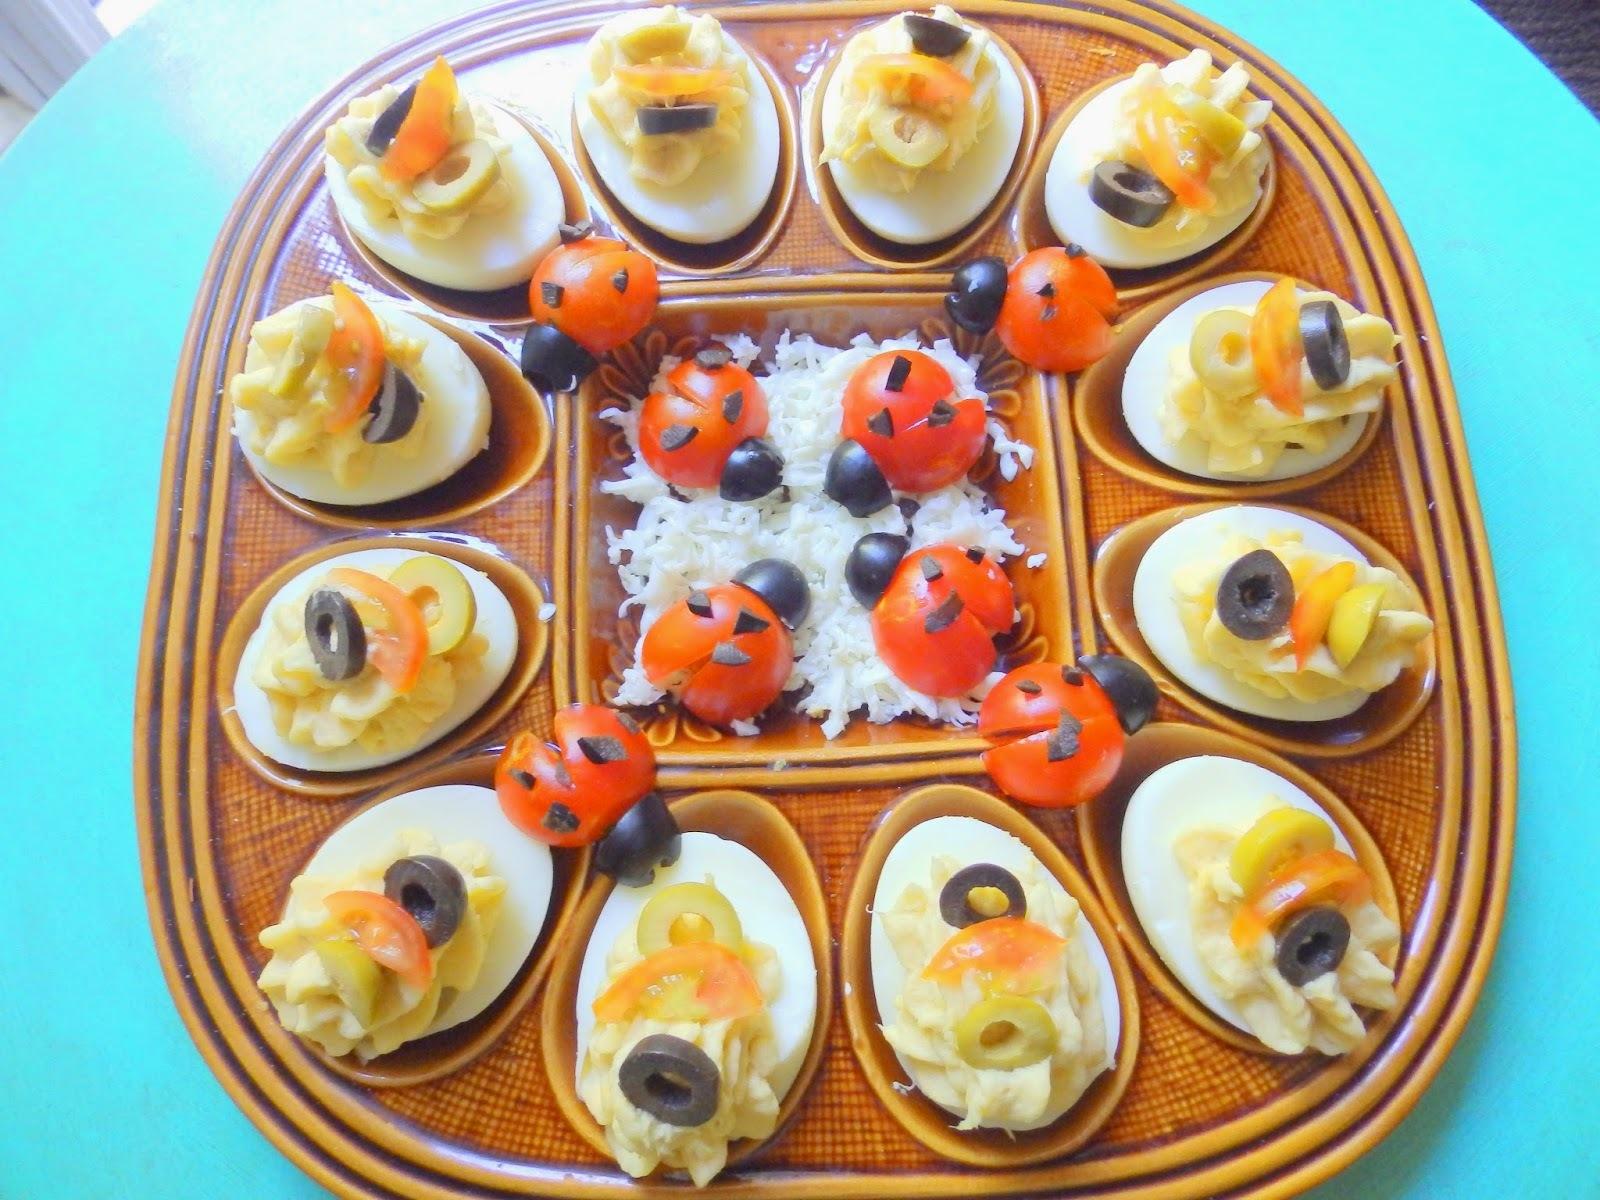 Ous farcits de brandada de bacallà / Huevos rellenos de brandada